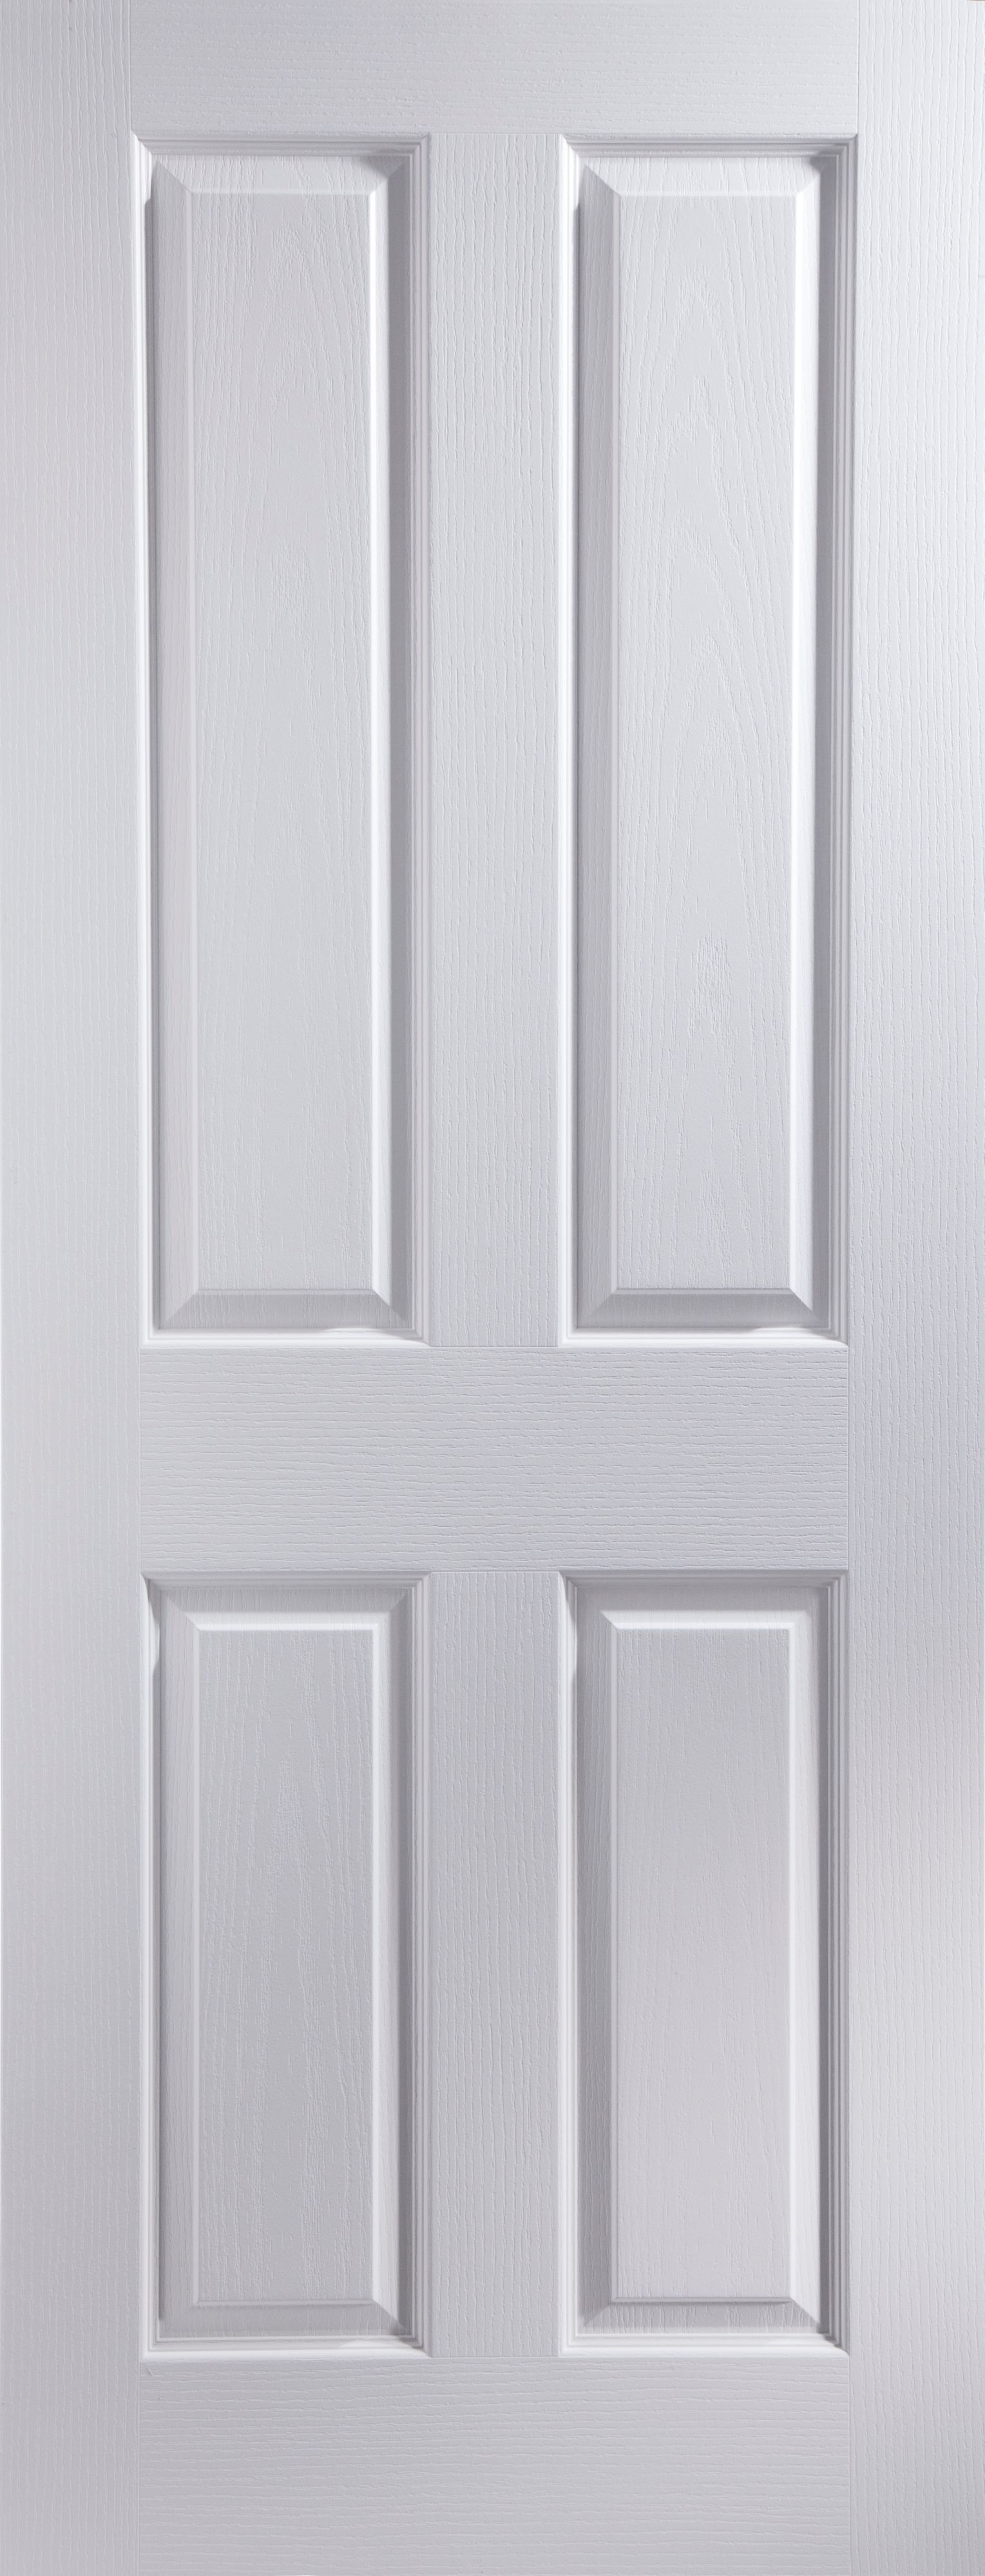 4 Panel Pre Painted White Woodgrain Internal Unglazed Door